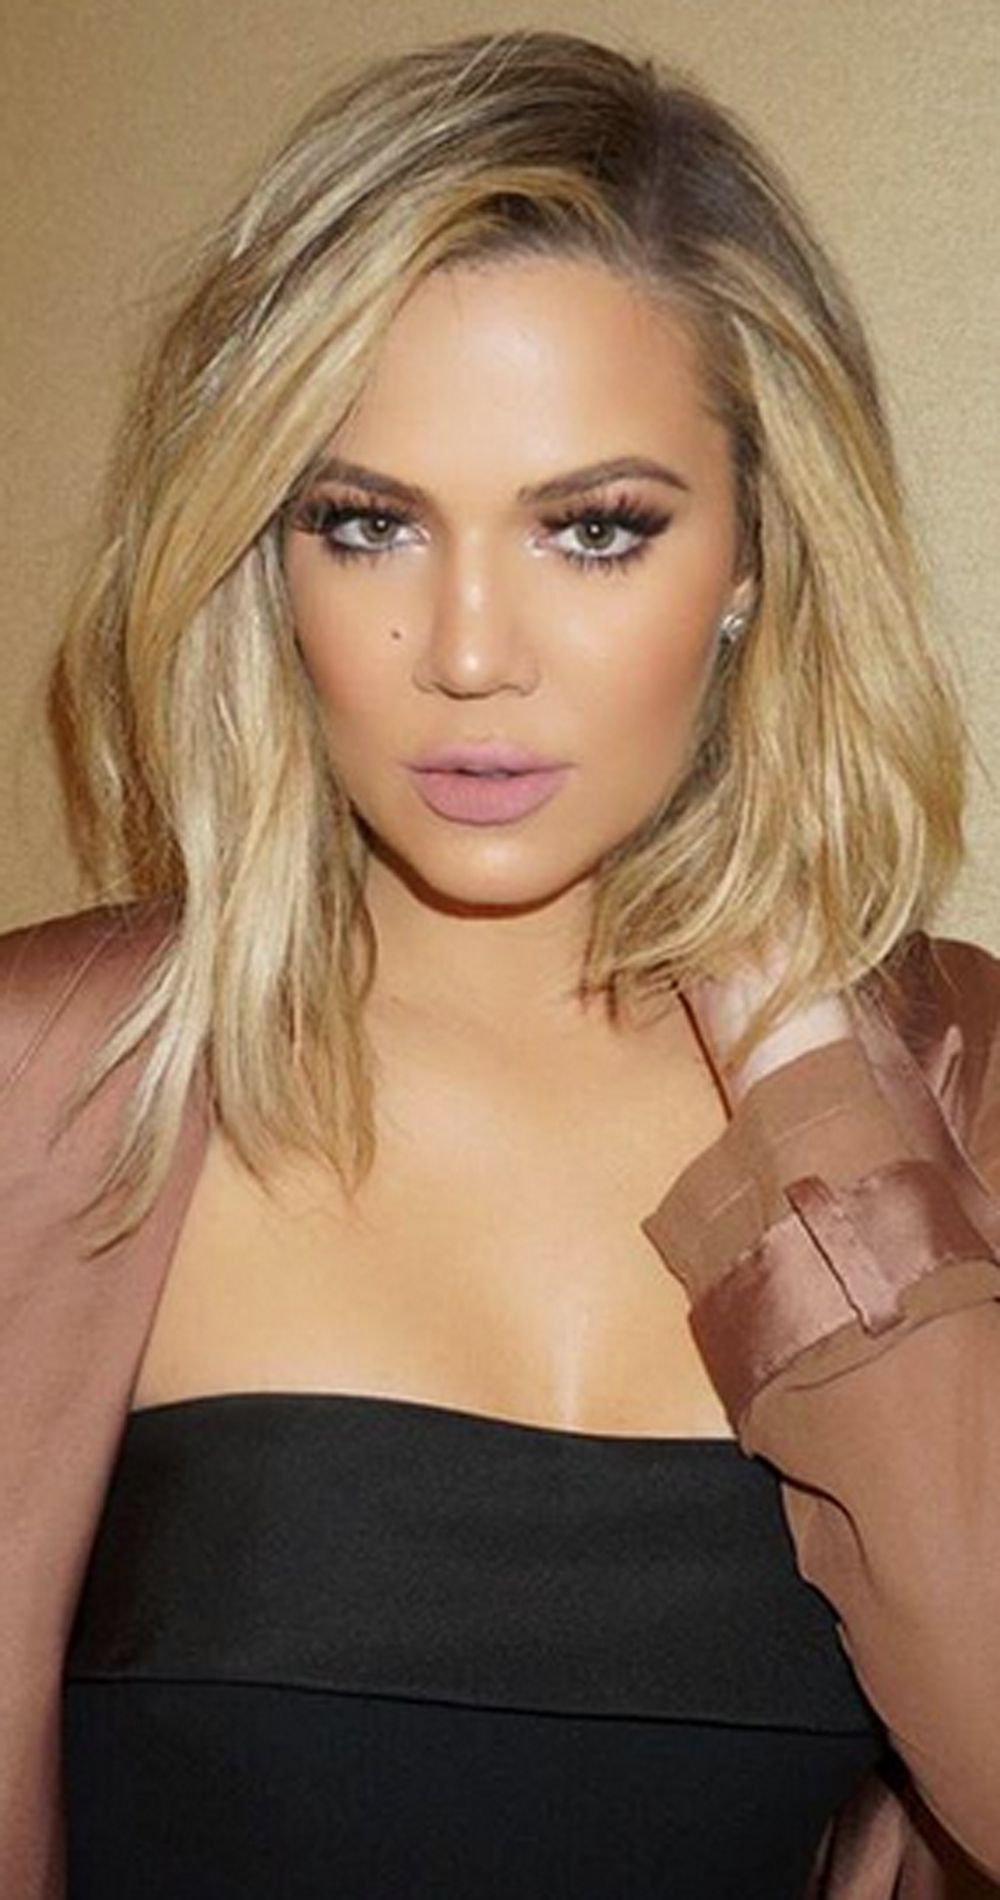 Khloe Kardashian On Her Fear Of Eyebrow Threading Hair Styles